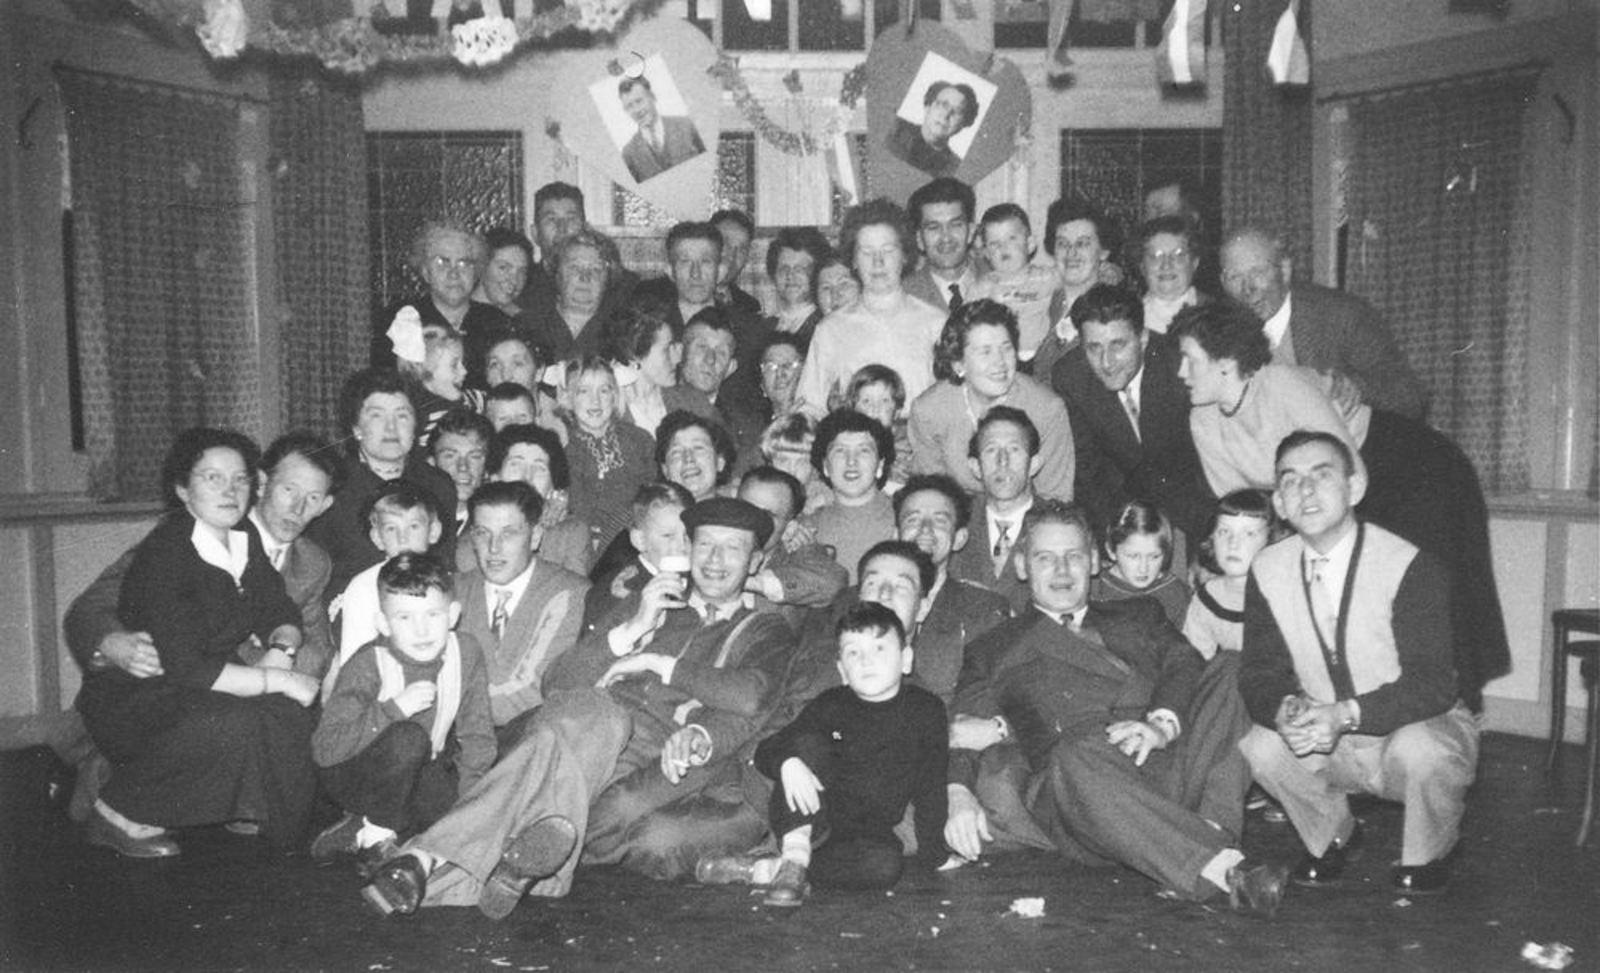 Dam-Stroomer Fam 1956 Onbekend Trouwerij 03